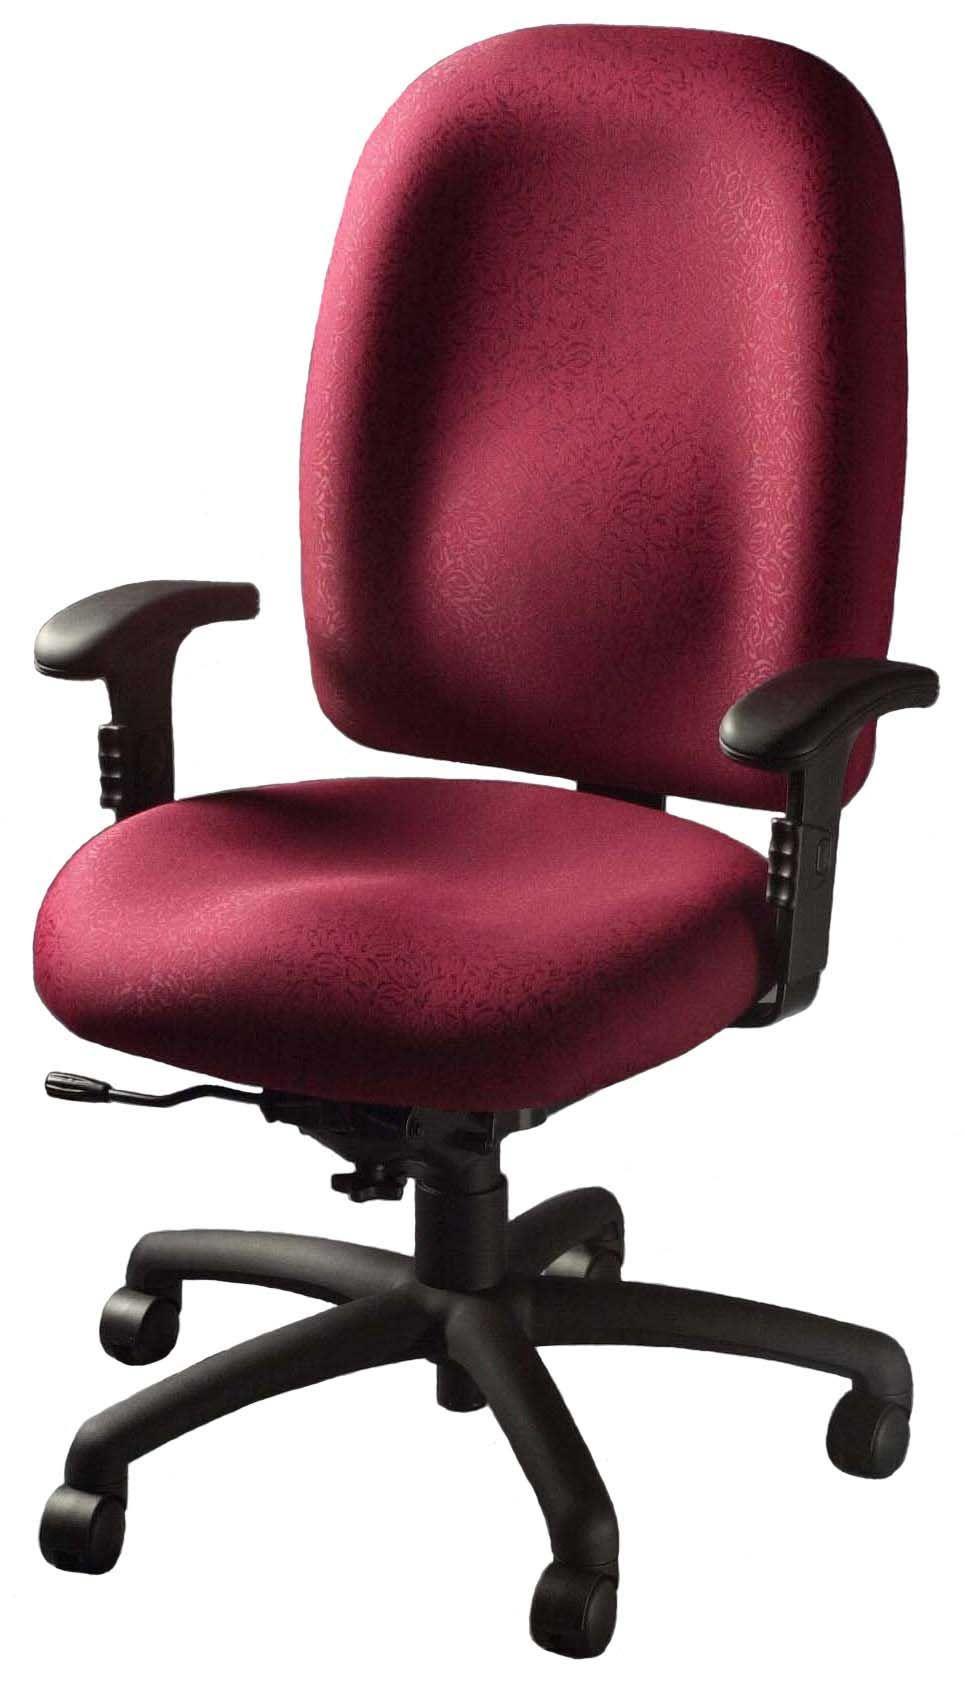 Pink Desktop Office Chairs Best Office Chair Modern Home Office